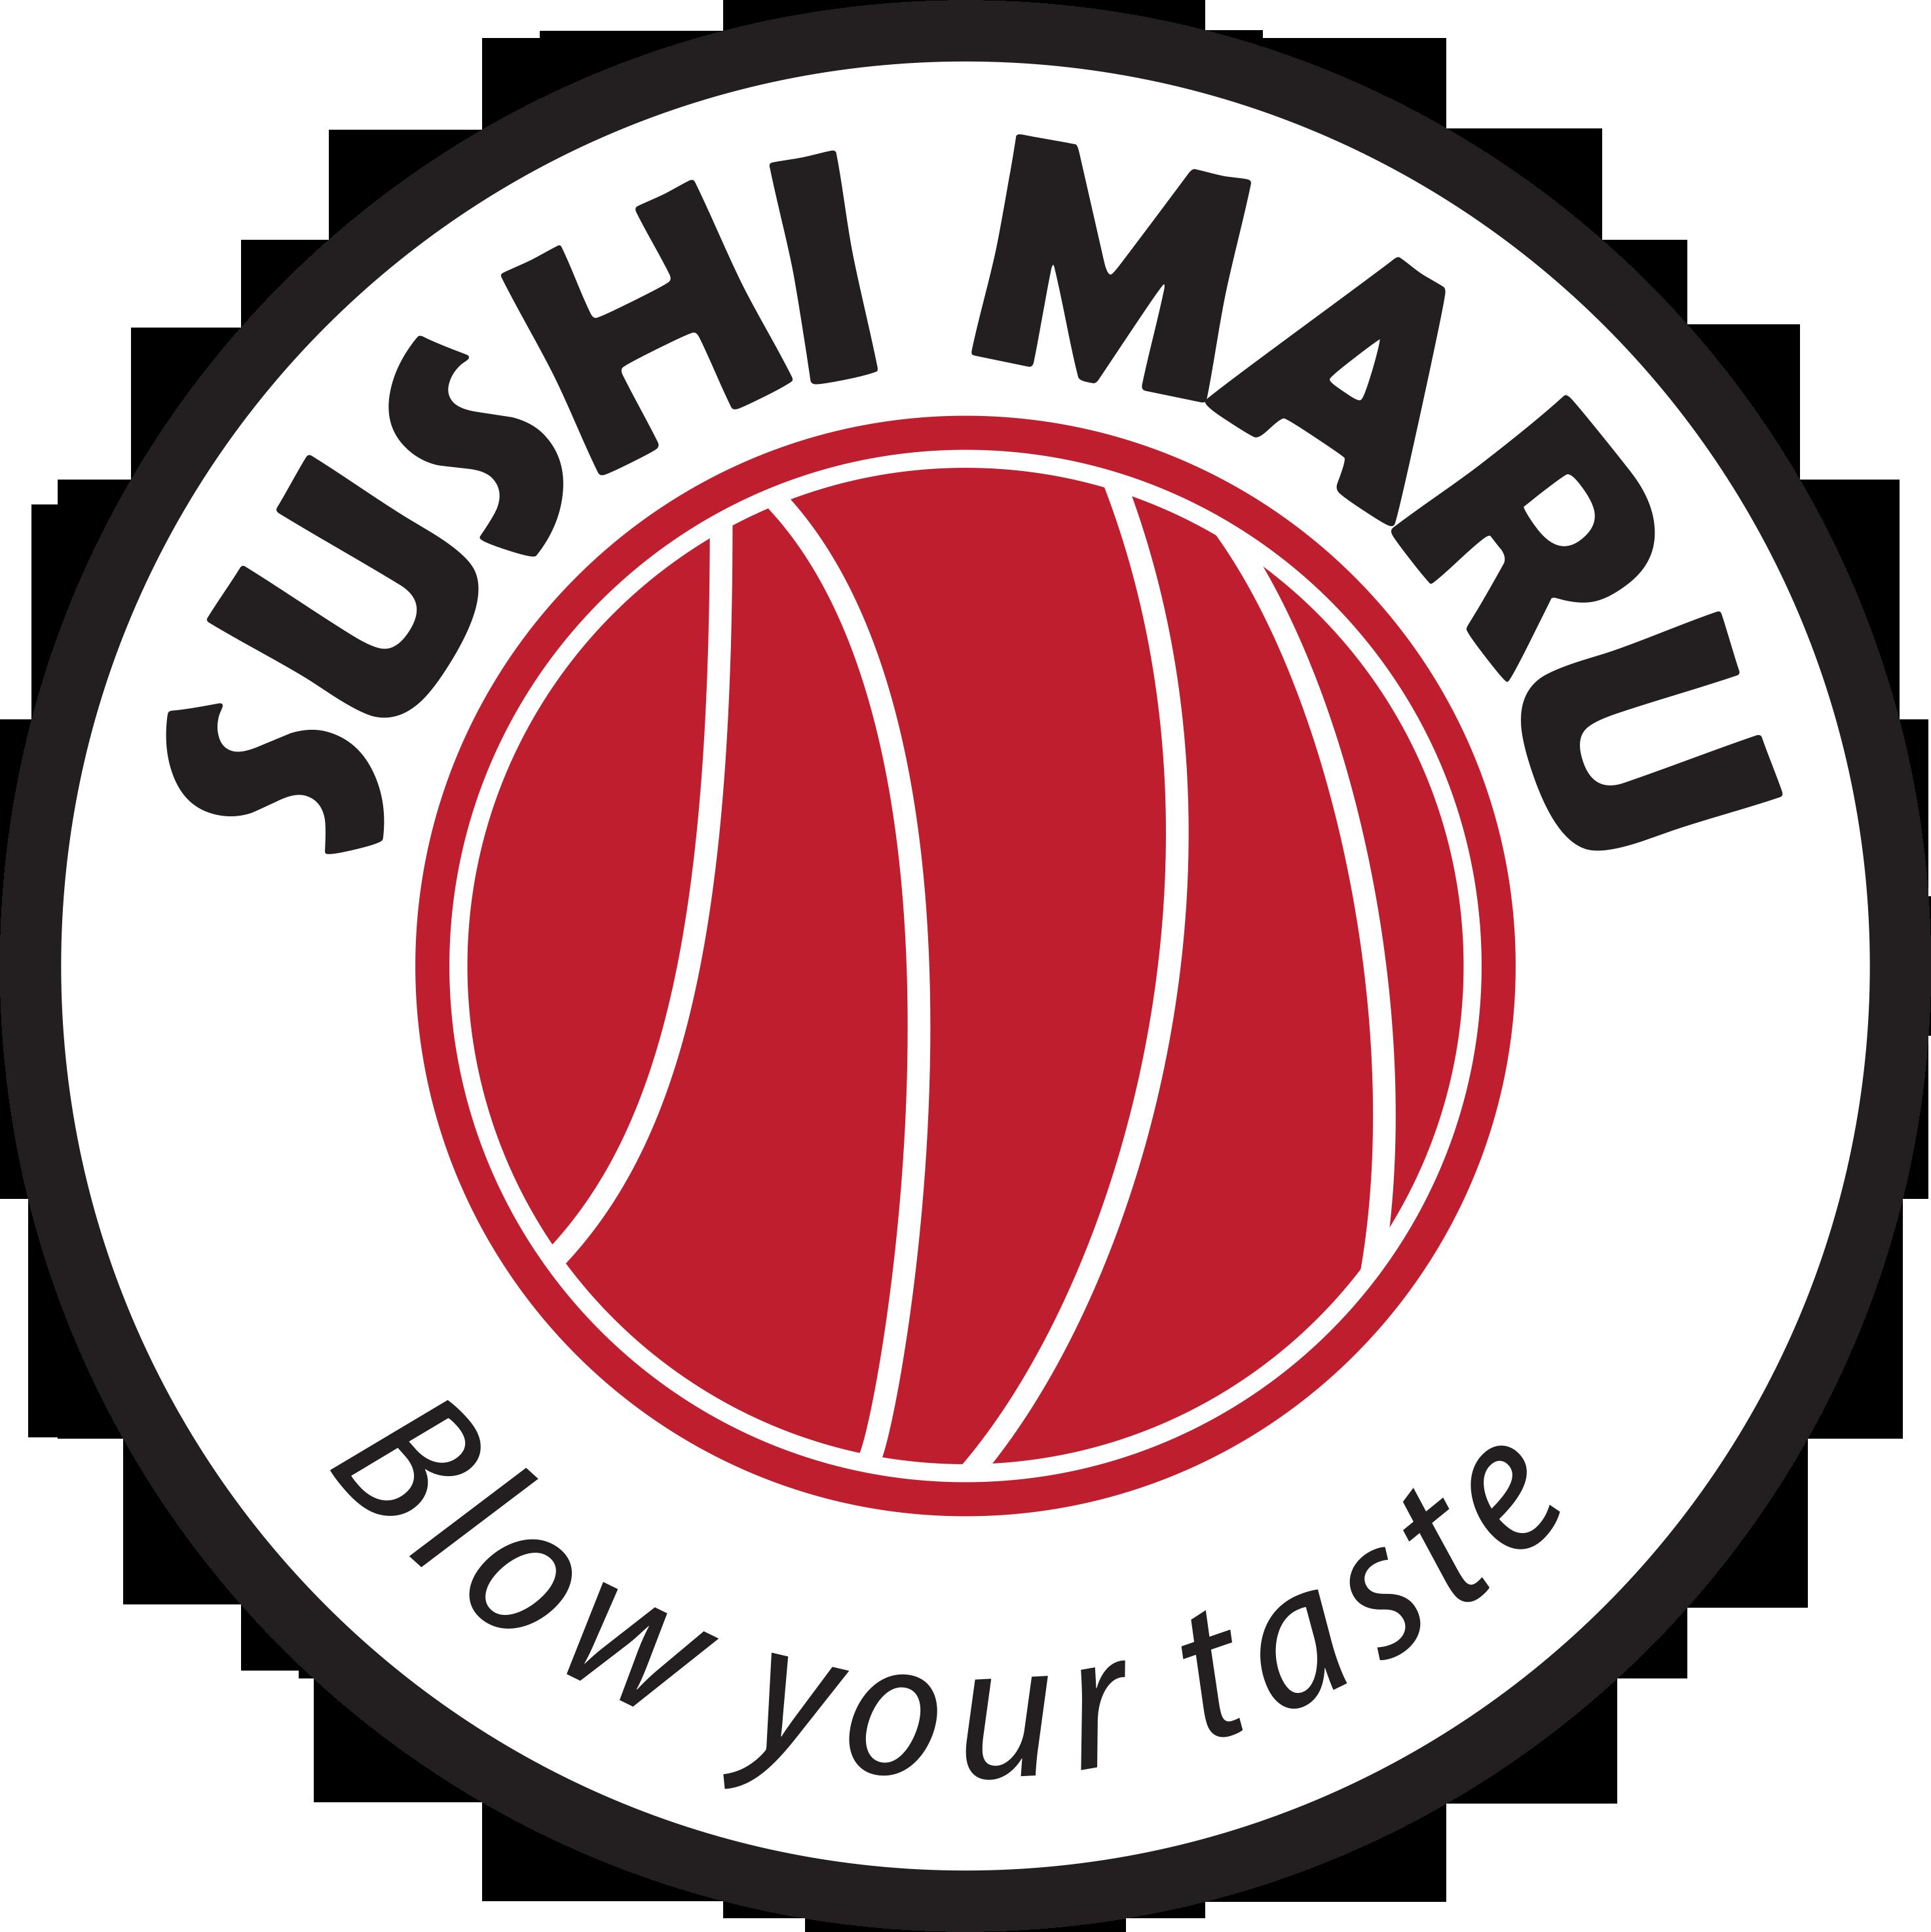 Logo's Sushi Maru - design by Doremon